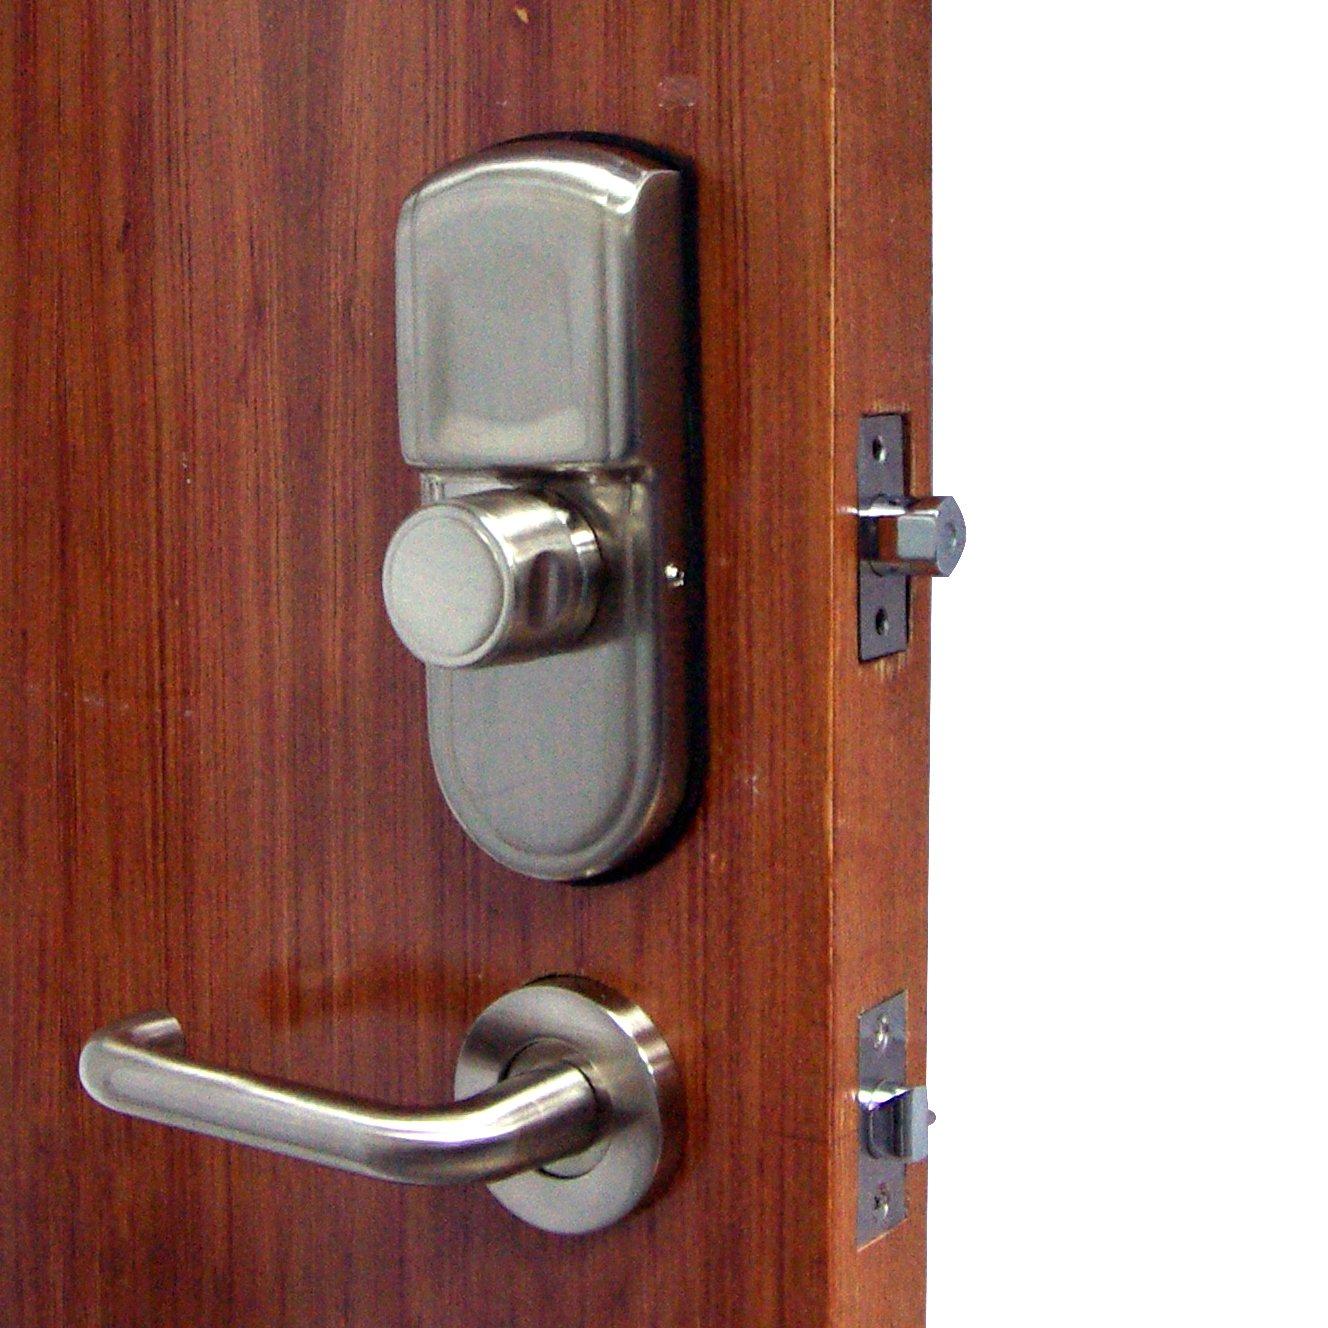 Assa Abloy Digi Keyless Hardware Electronic Digital Keypad Fingerprint Door Lock Deadbolt Deadlock Knob Lever Handle Handleset 98b High Security (Satin ...